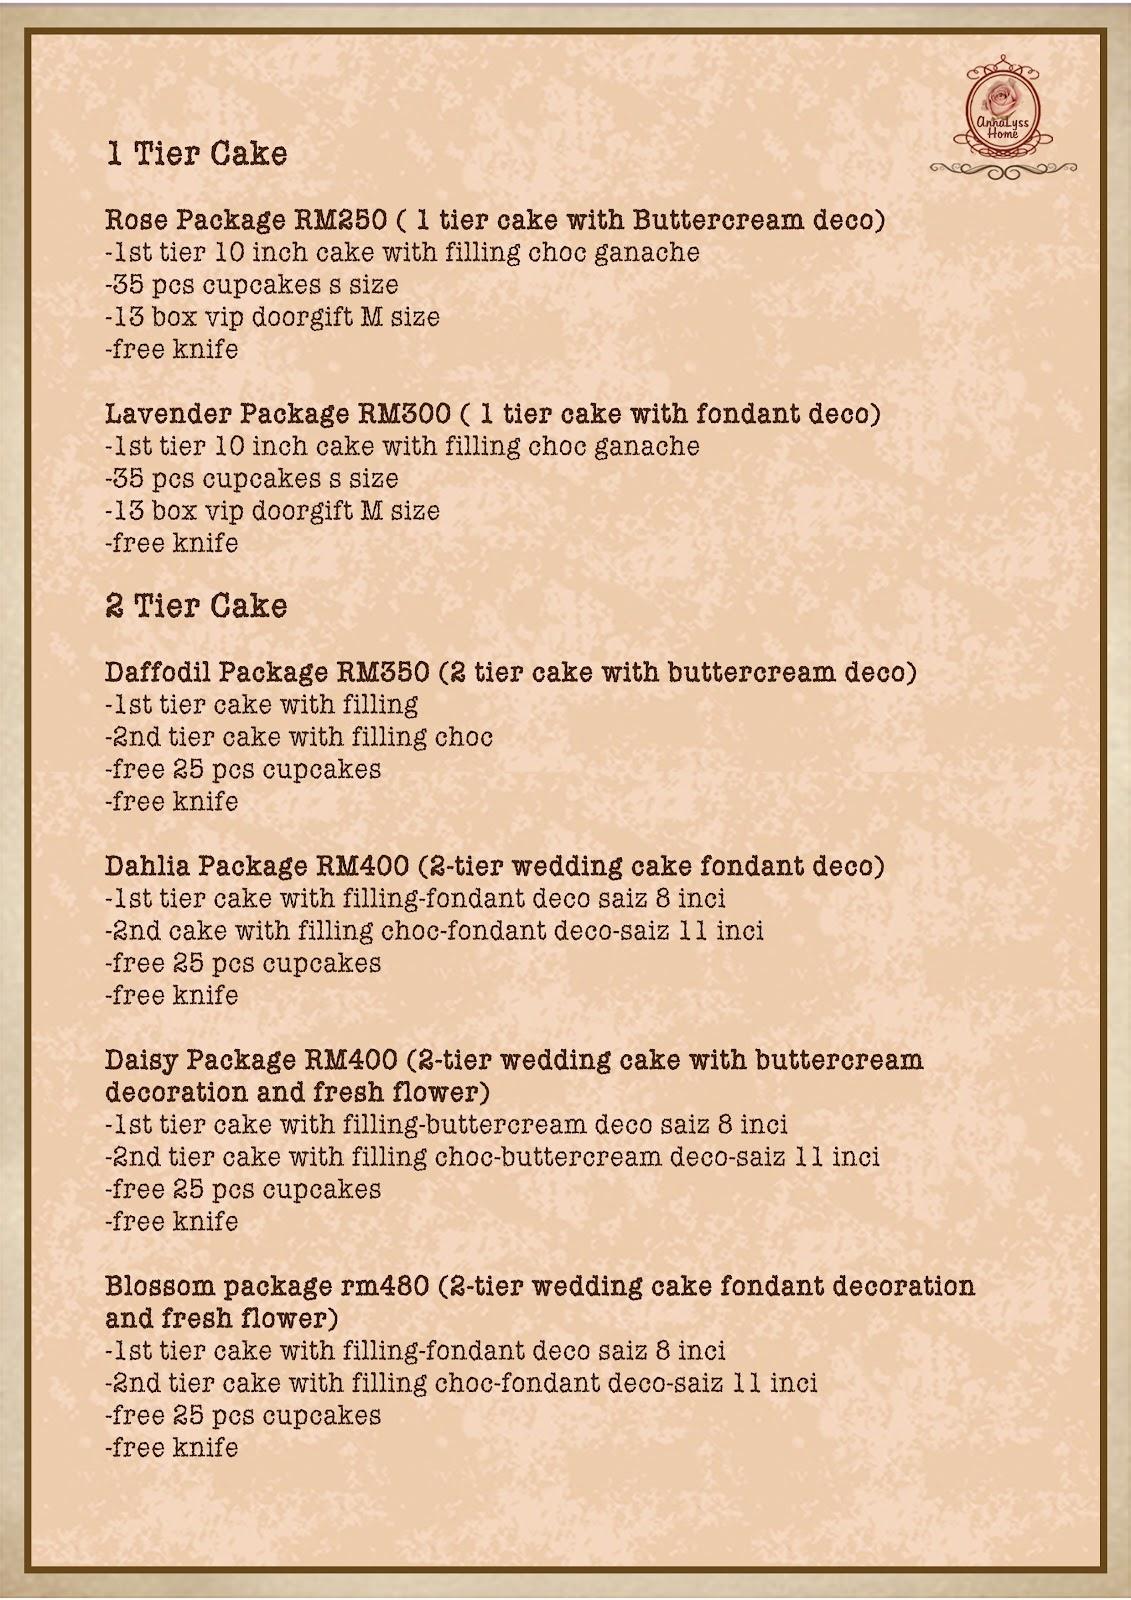 Order Wedding Cake Costco Costco form order wedding cake submited